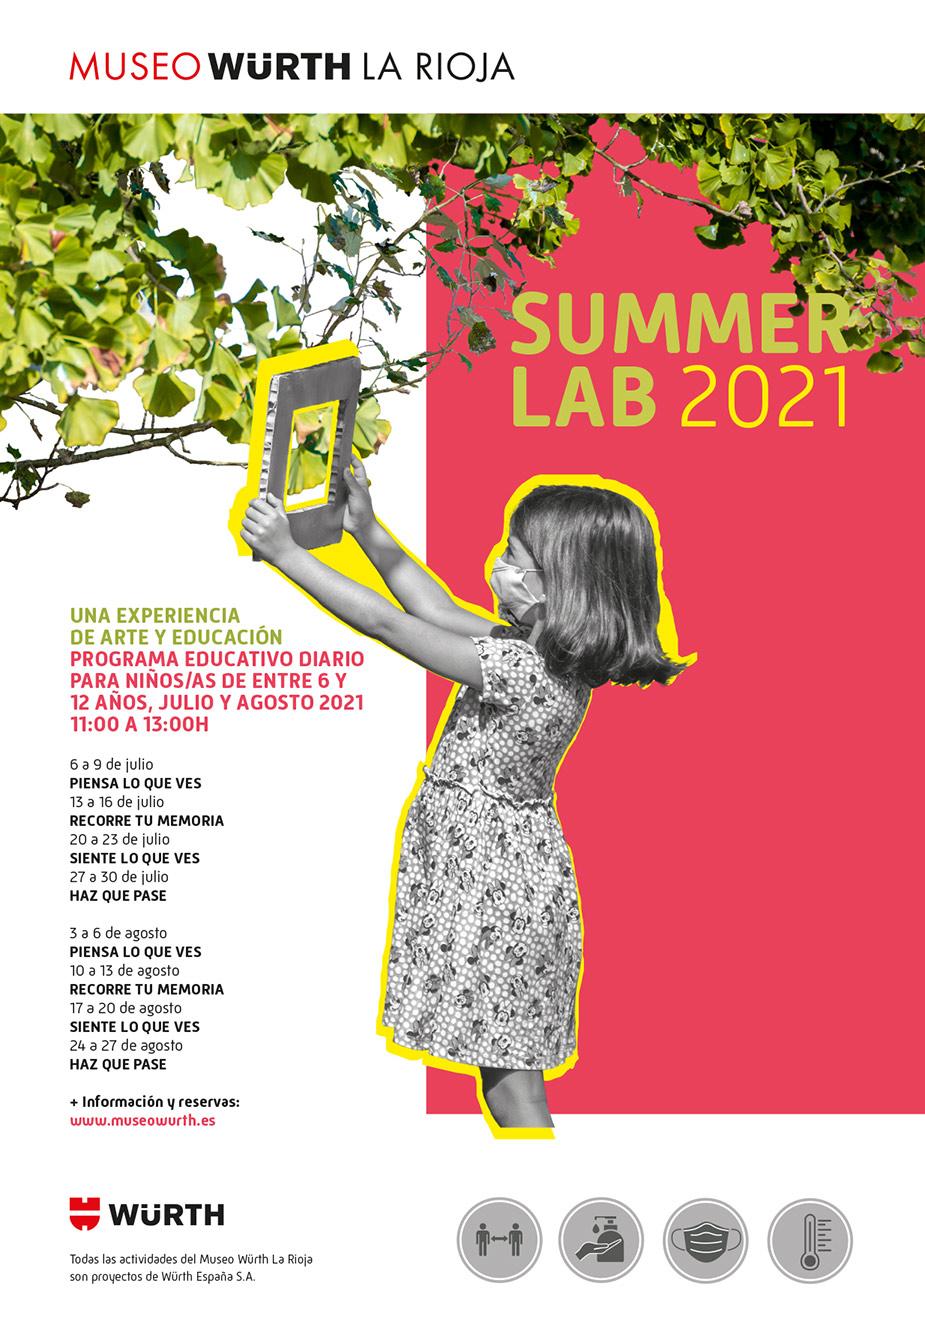 Summer Lab 2021